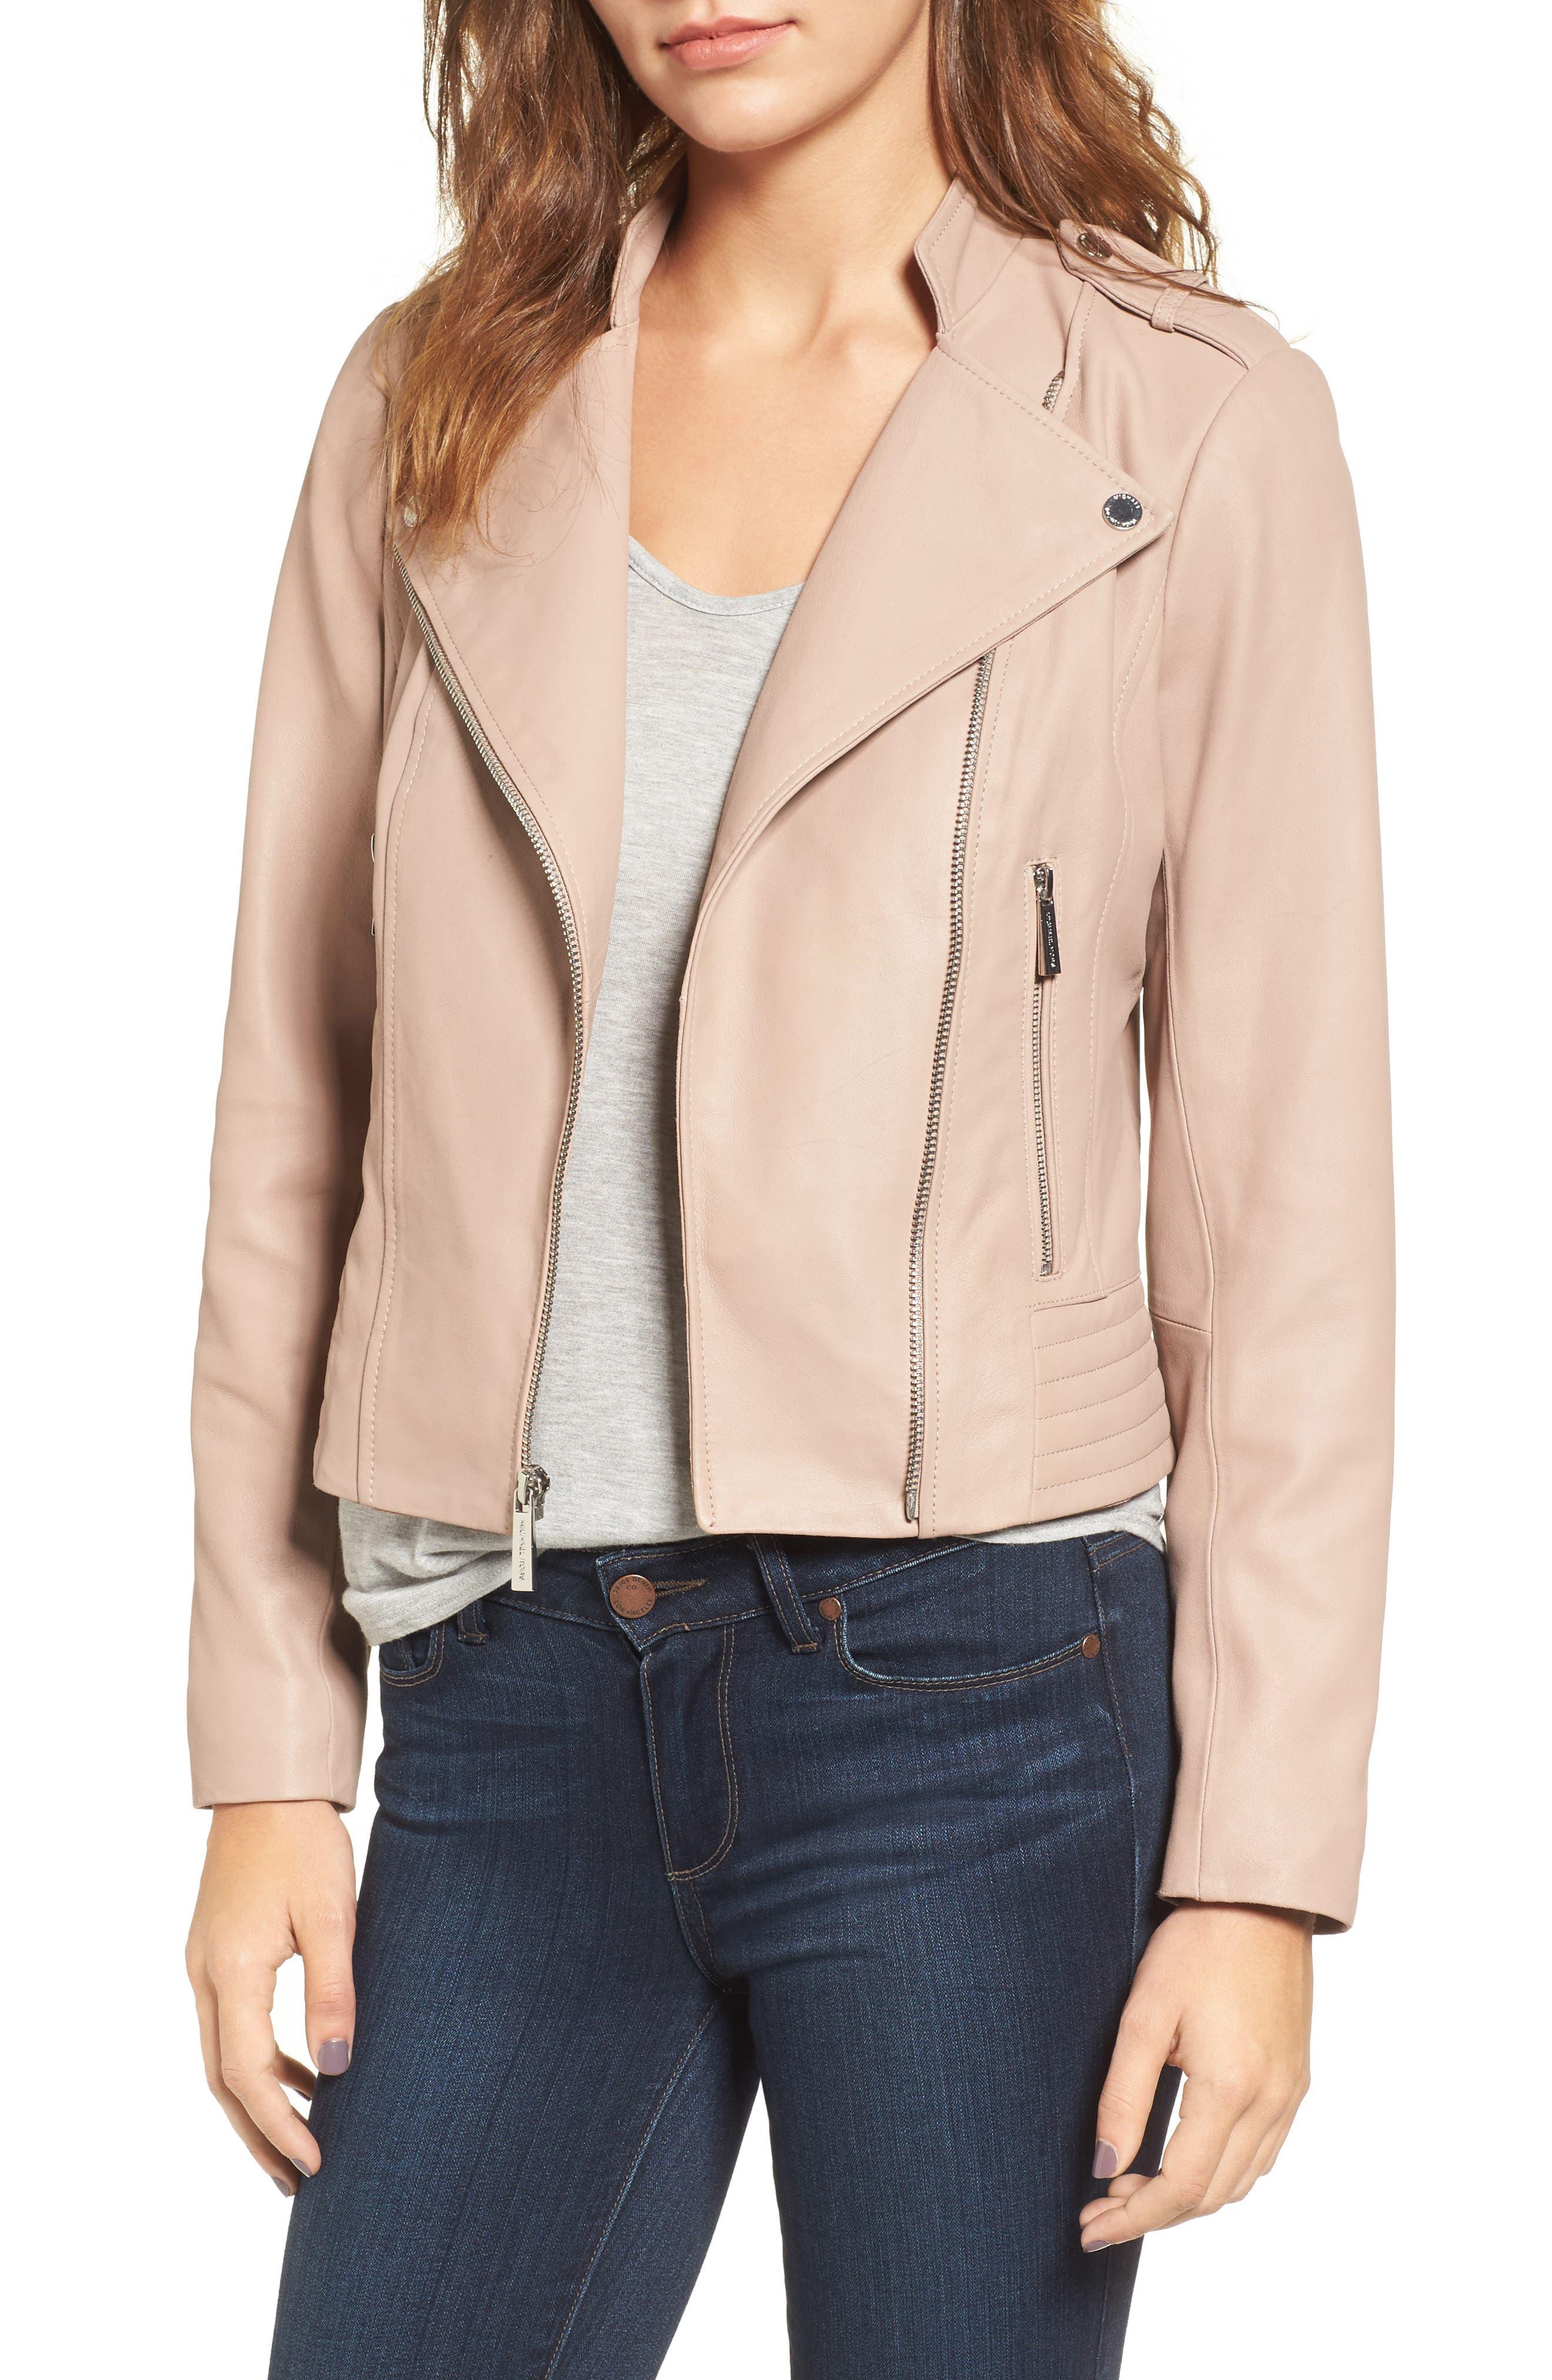 Alternate Image 1 Selected - MICHAEL Michael Kors Leather Moto Jacket